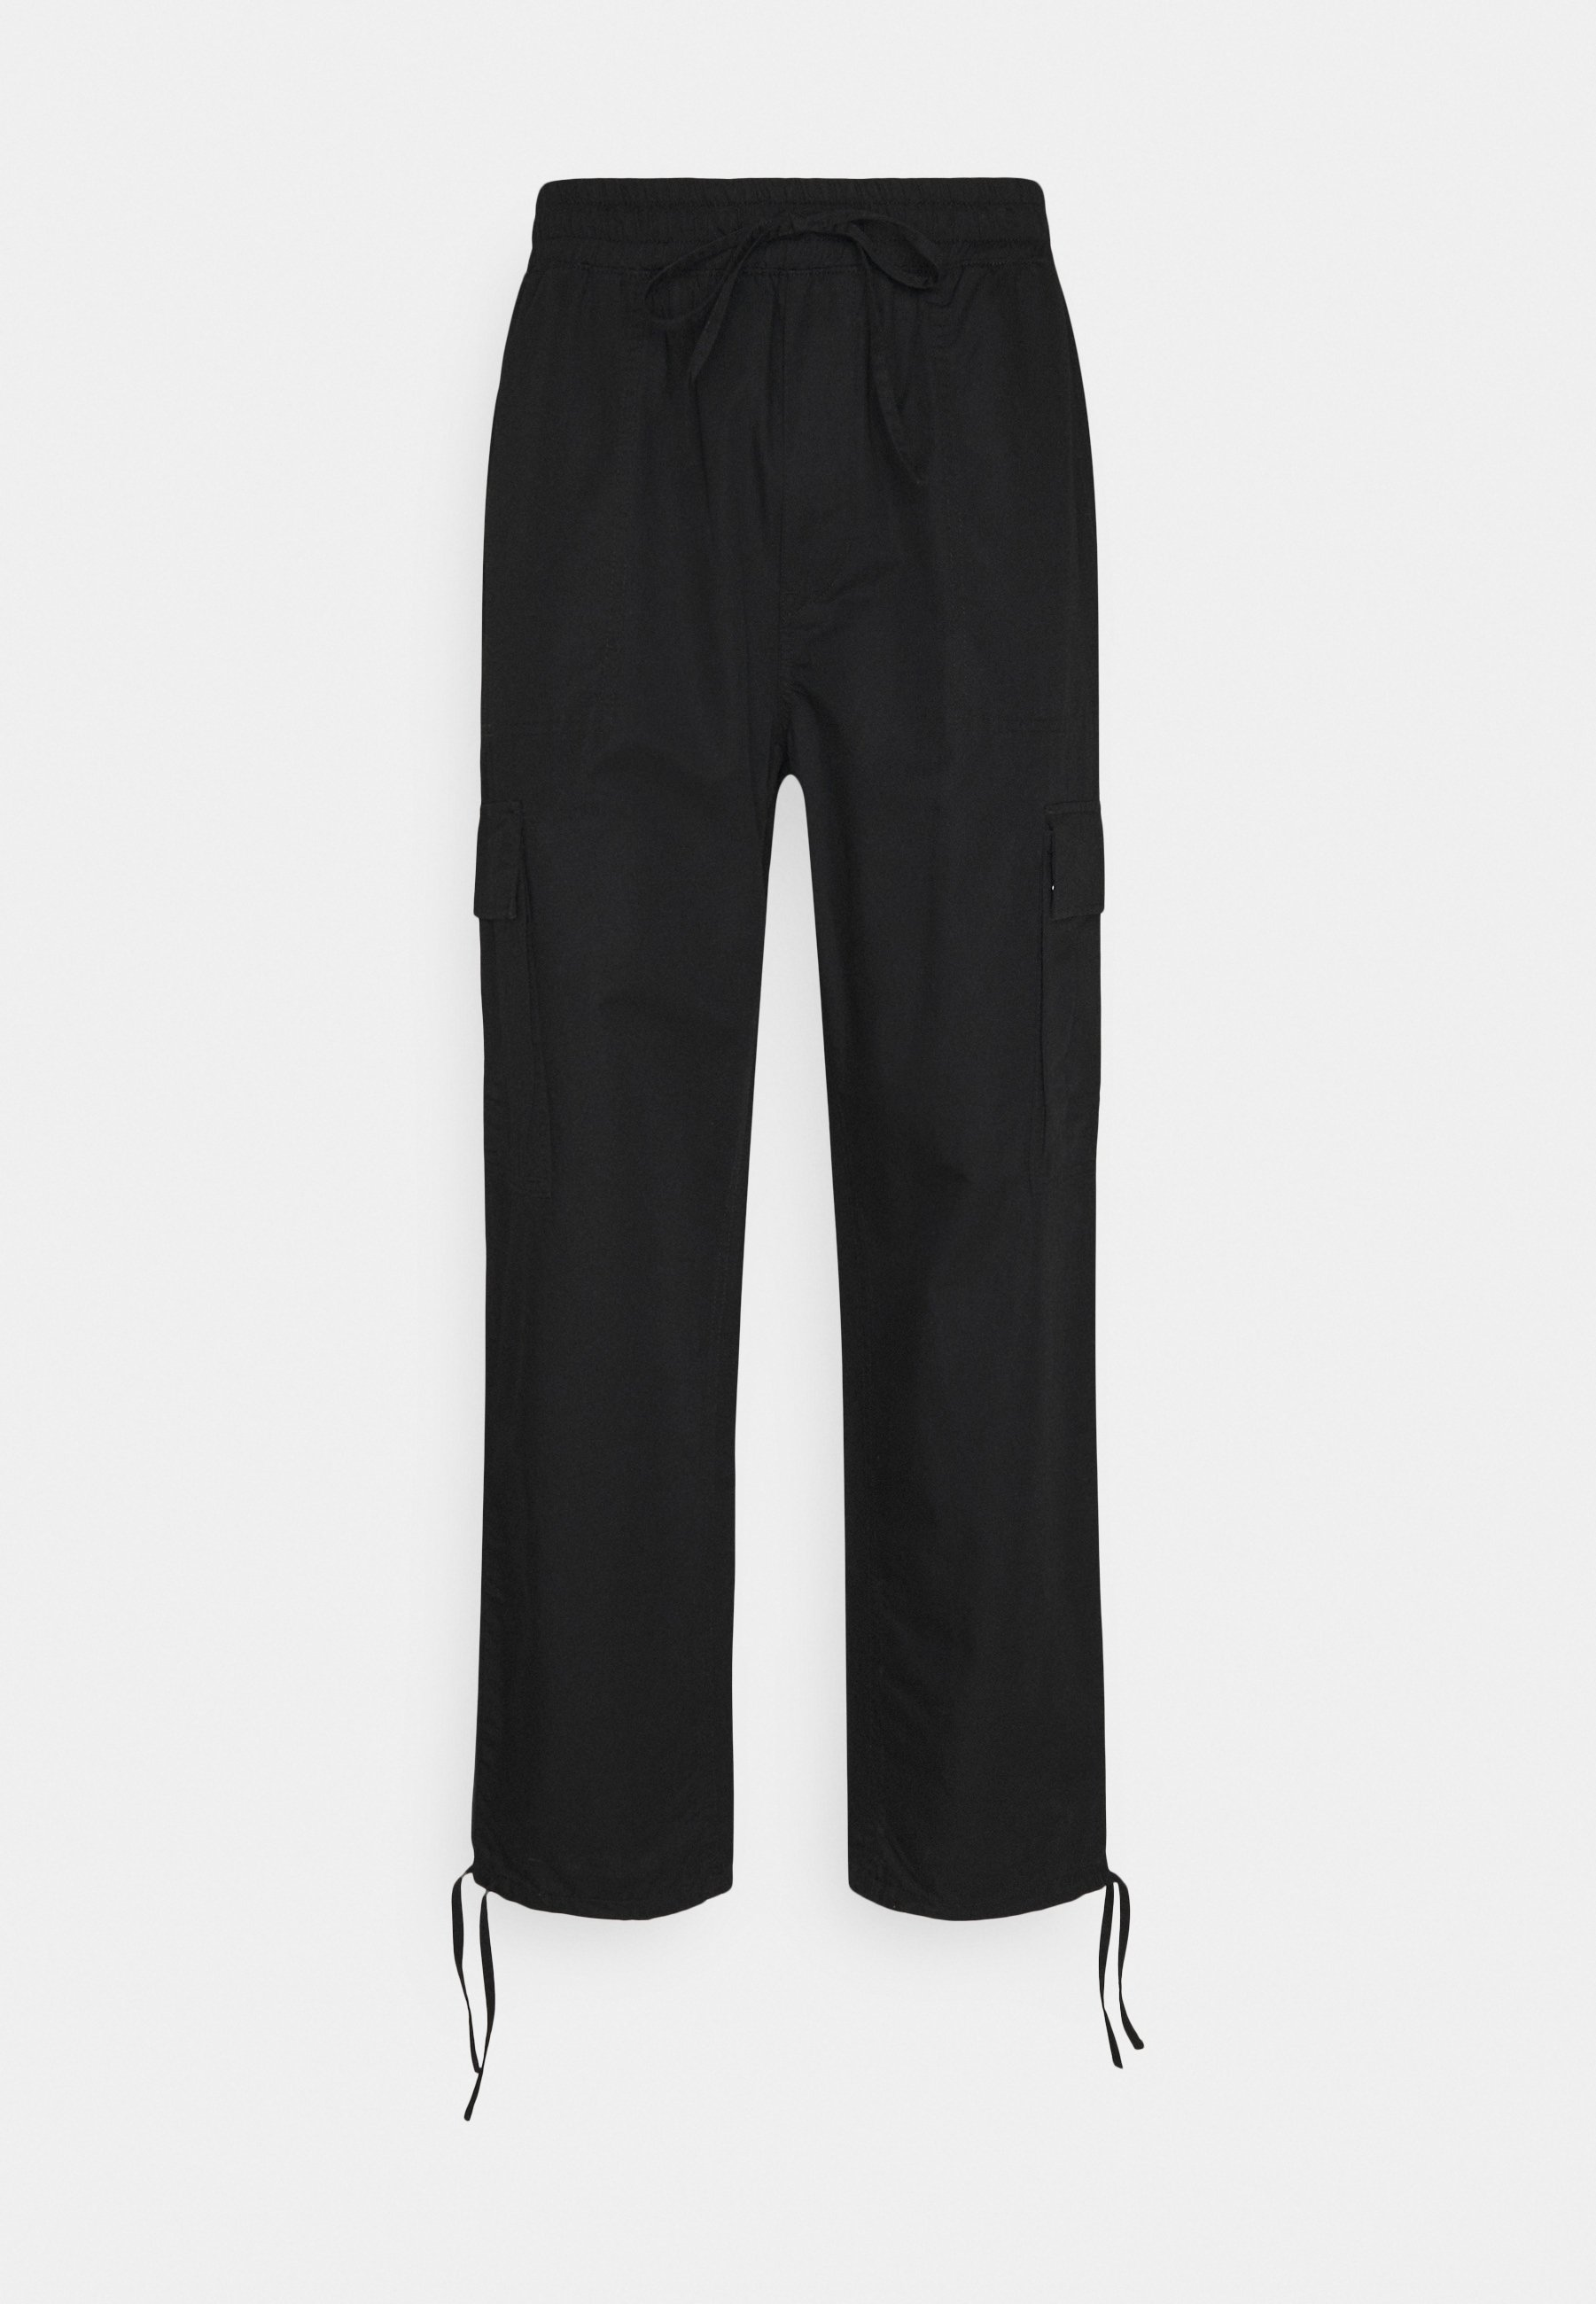 Homme KRISTOFFER TORUSERS - Pantalon cargo